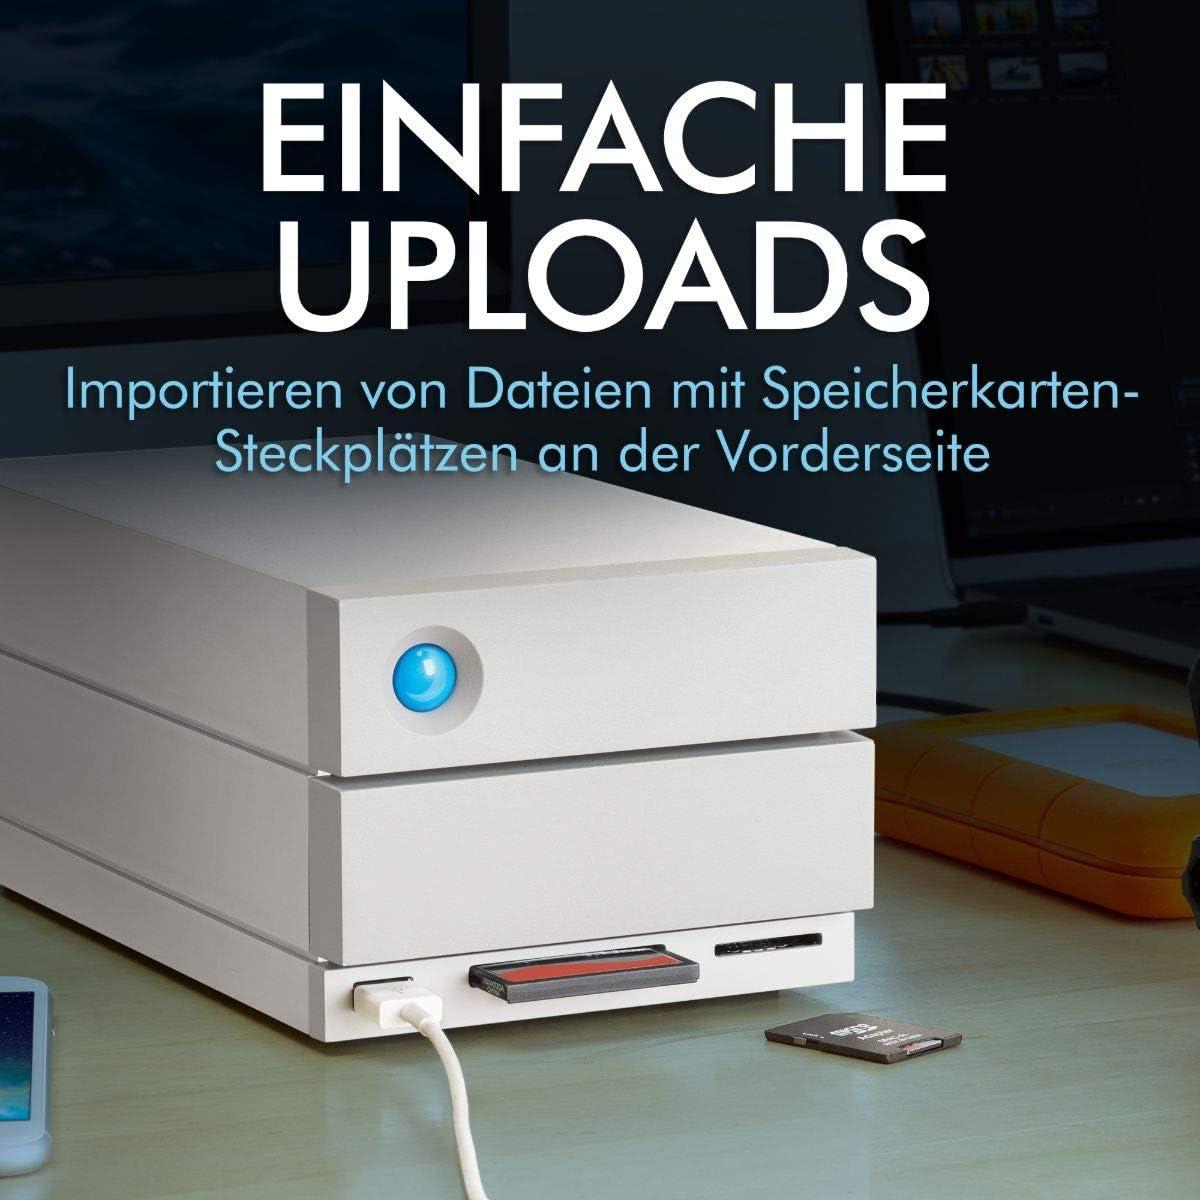 Lacie 2big Dock Thunderbolt 3 External Hard Drive 12tb Computers Accessories